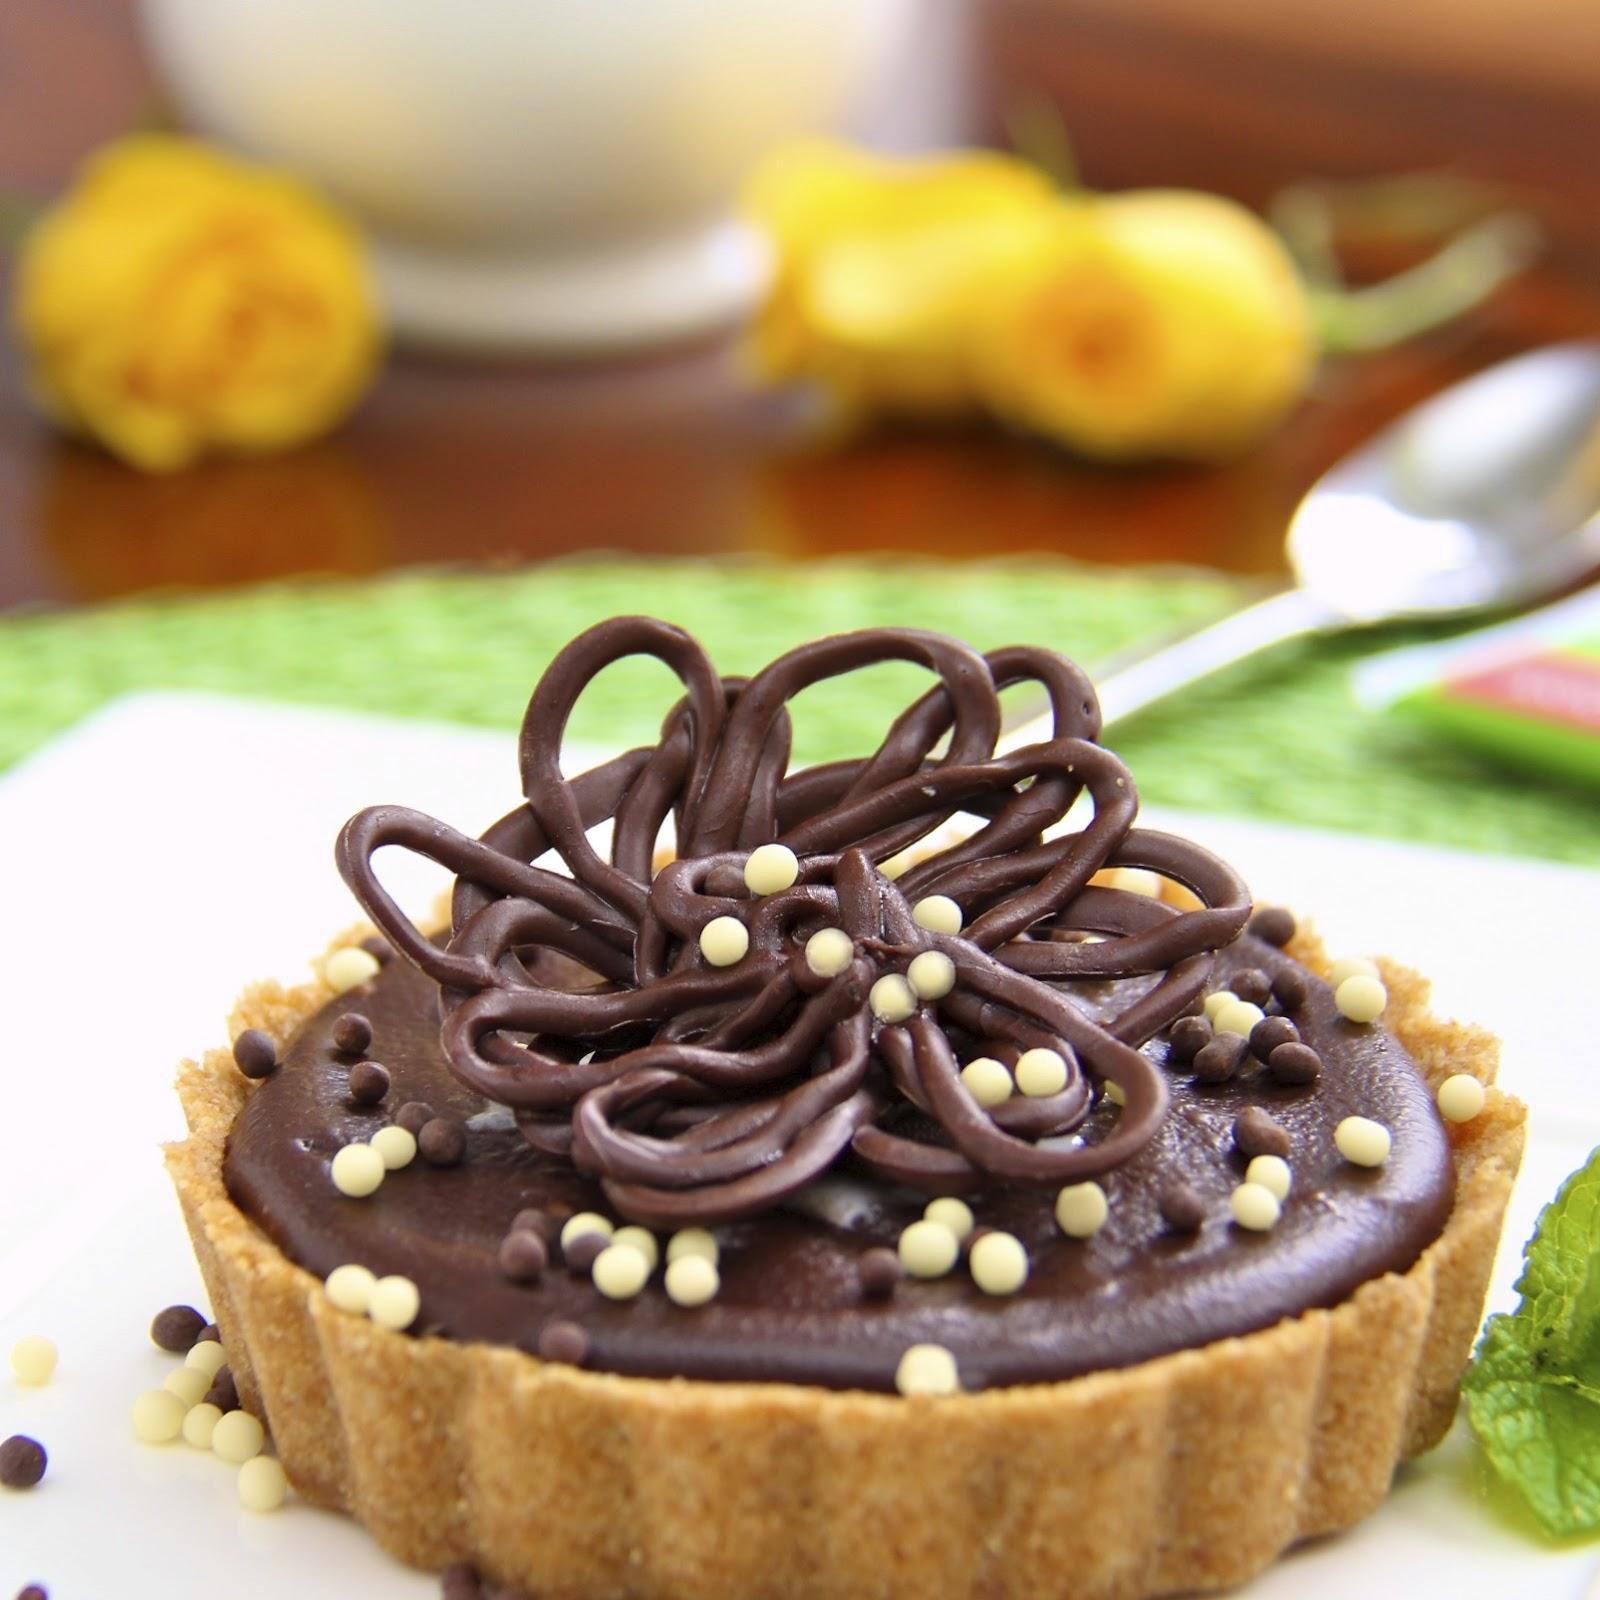 : Peanut Butter Tart with Shortbread Crust & Chocolate Ganache Glaze ...